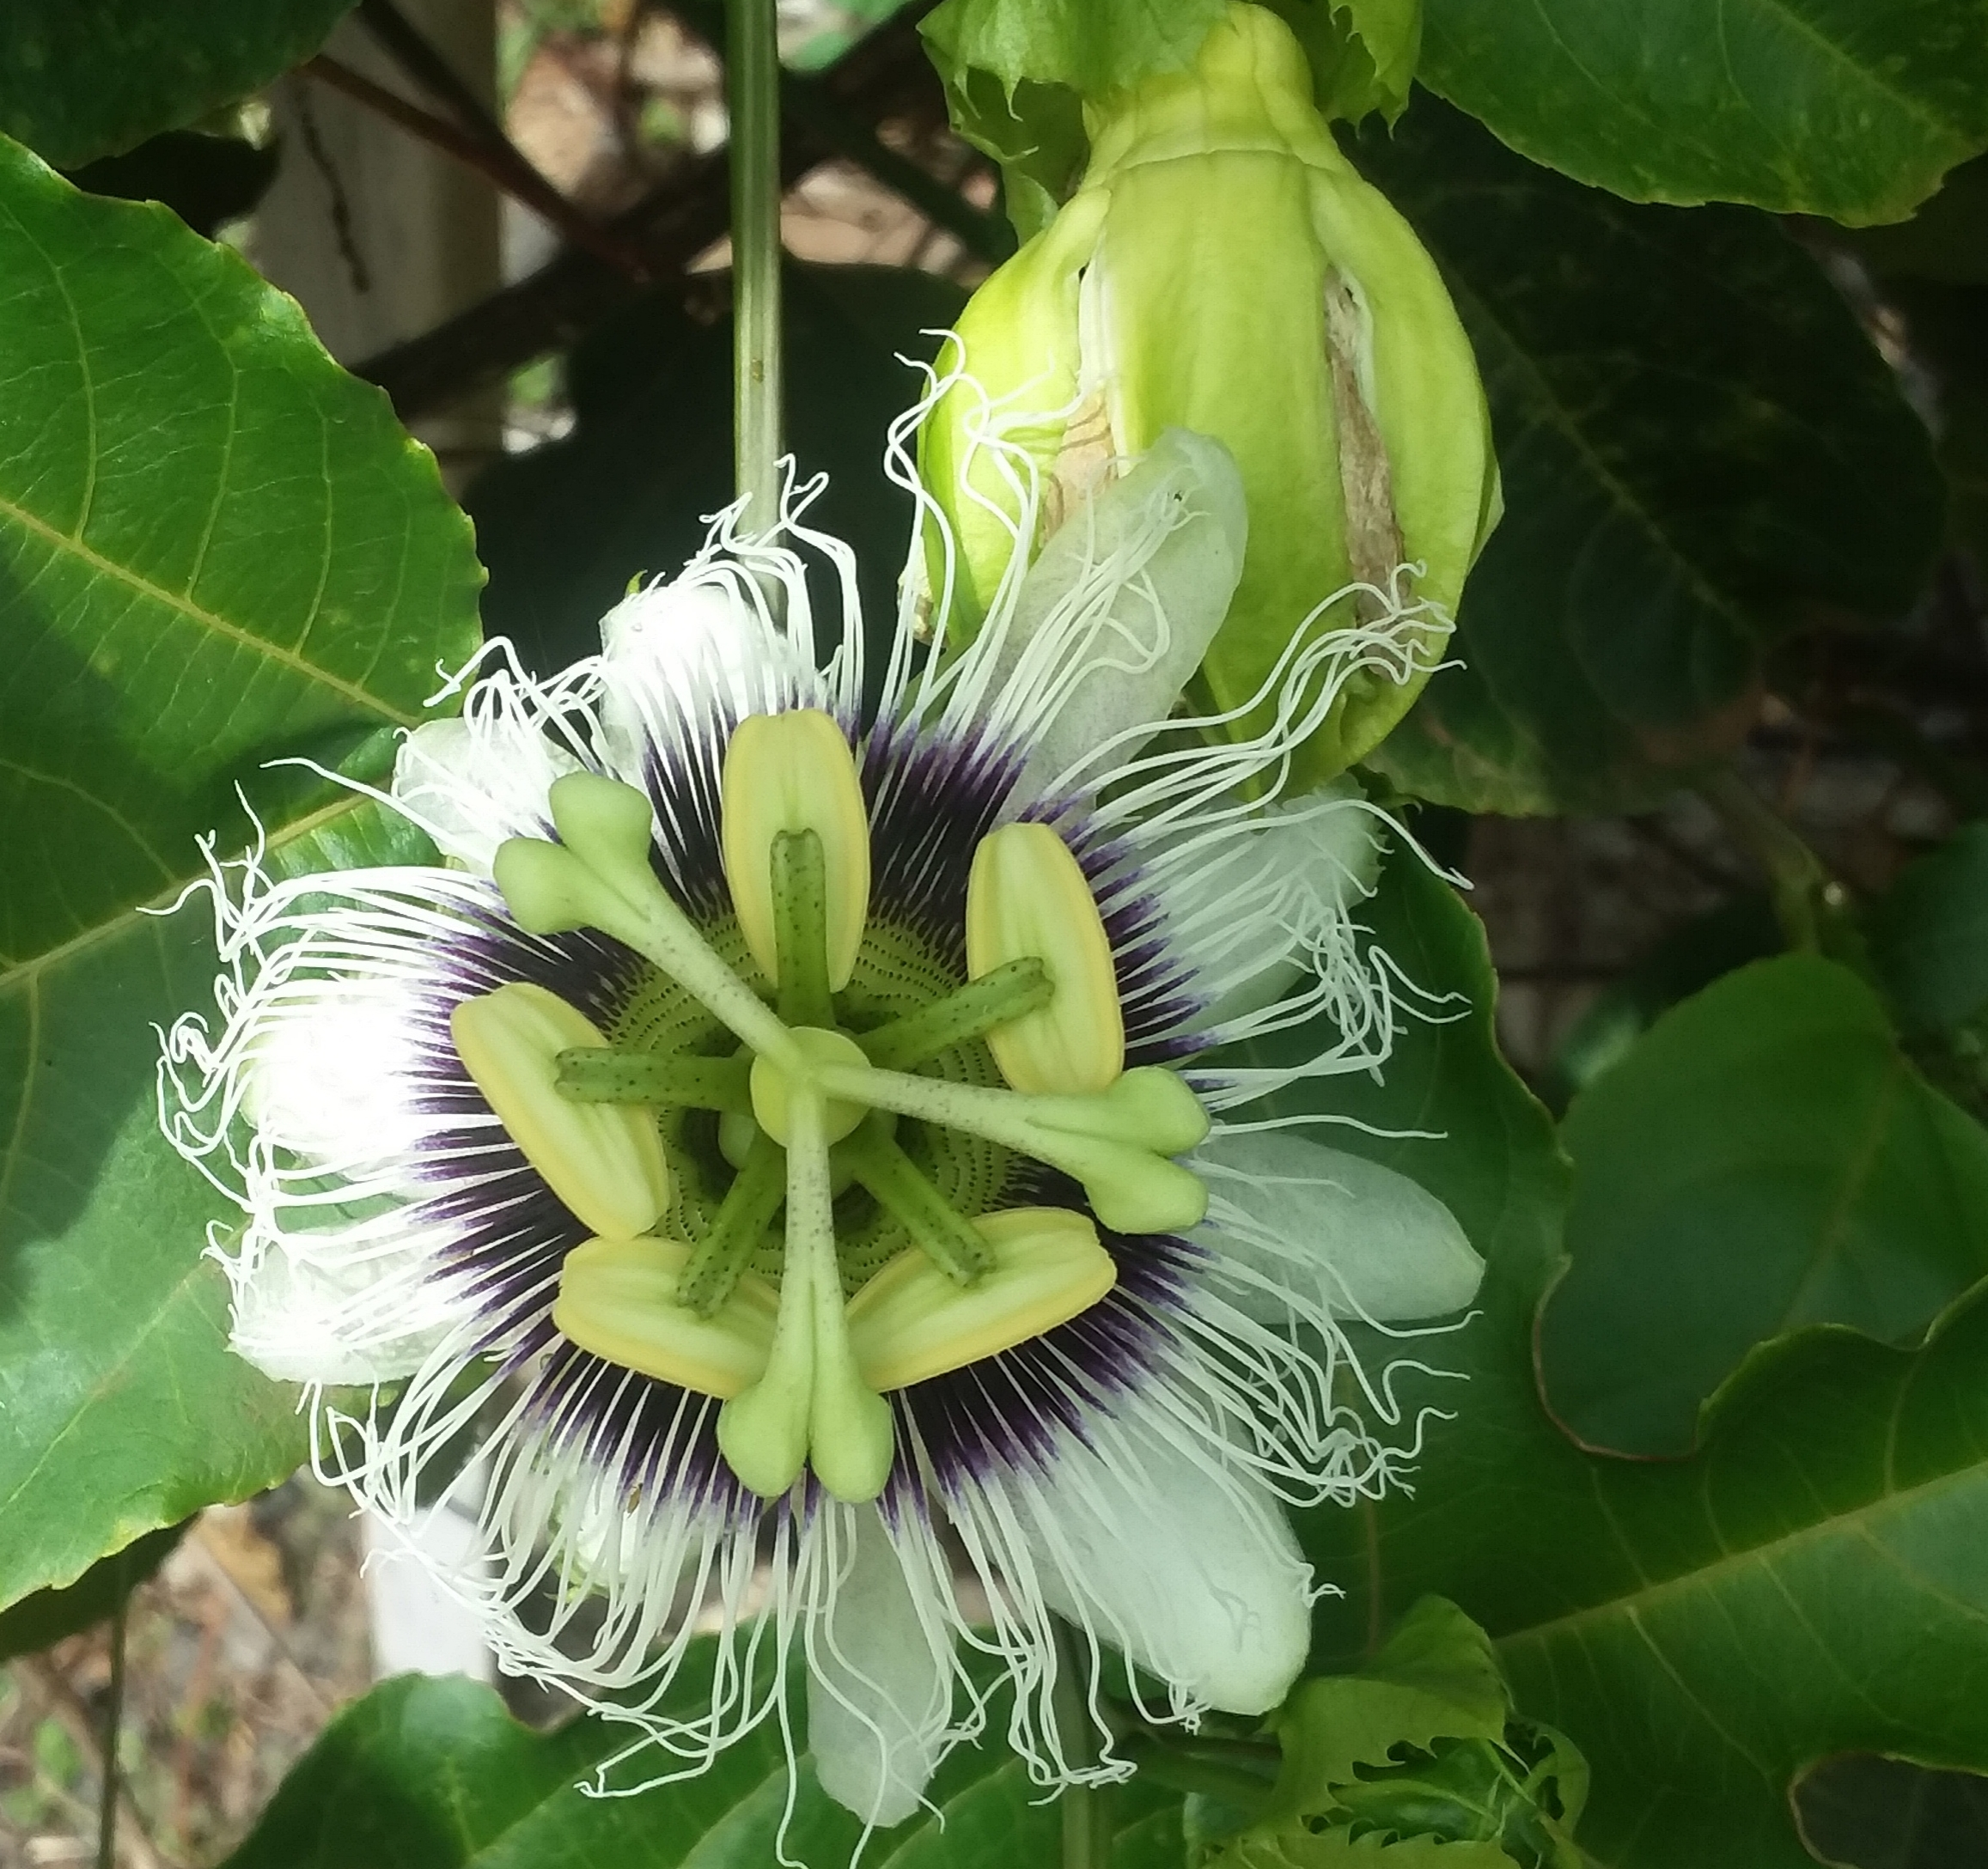 Lilikoi, AKA Passion Flower